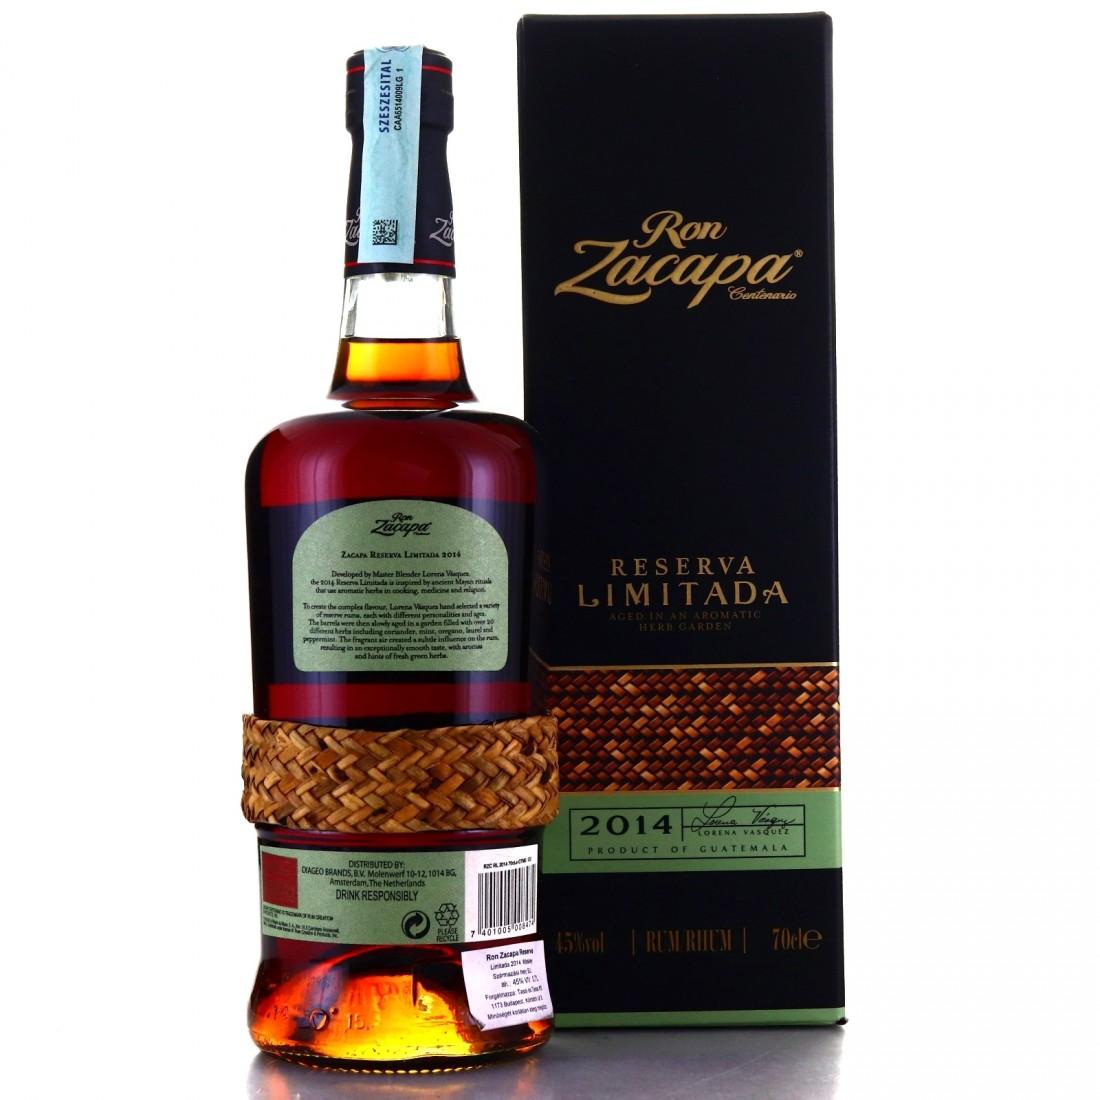 Ron Zacapa Reserva Limitada 2014